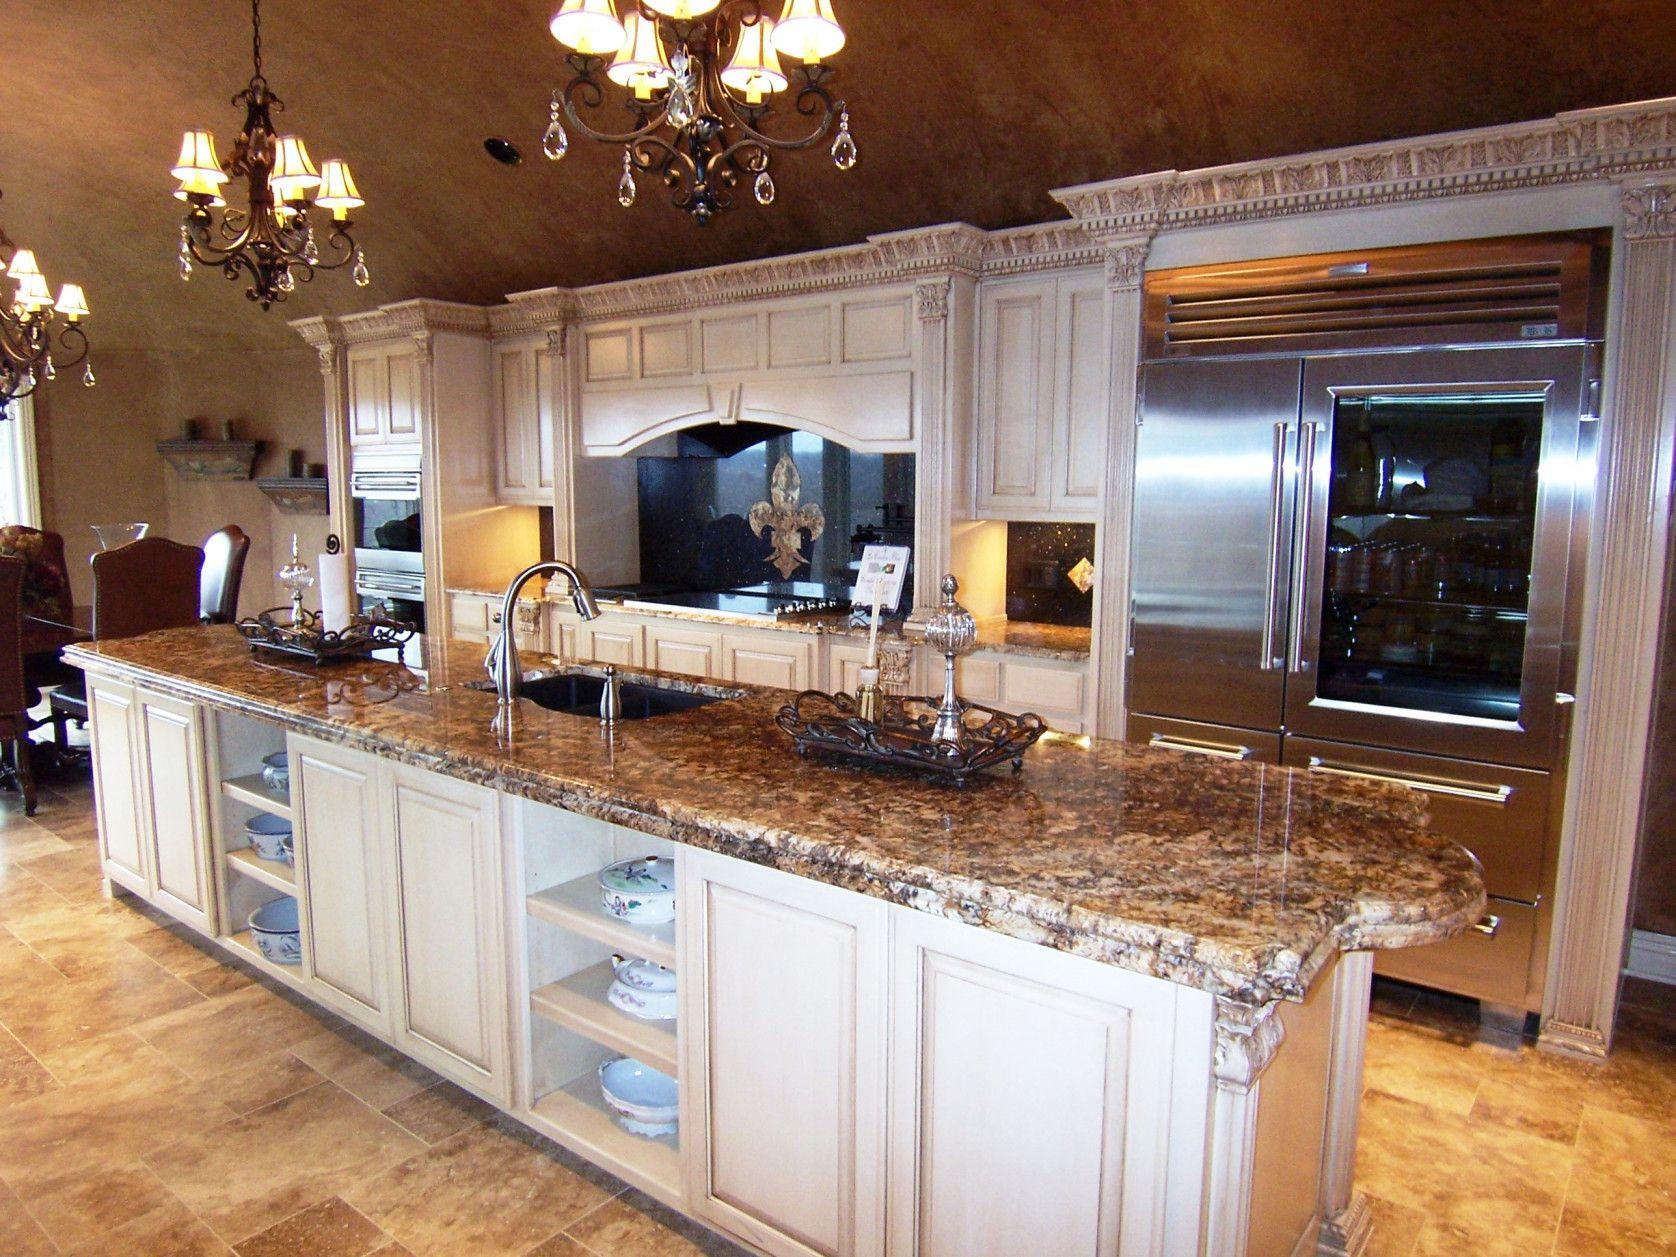 2019 Discount Kitchen Cabinets orlando - Kitchen Decor theme Ideas ...